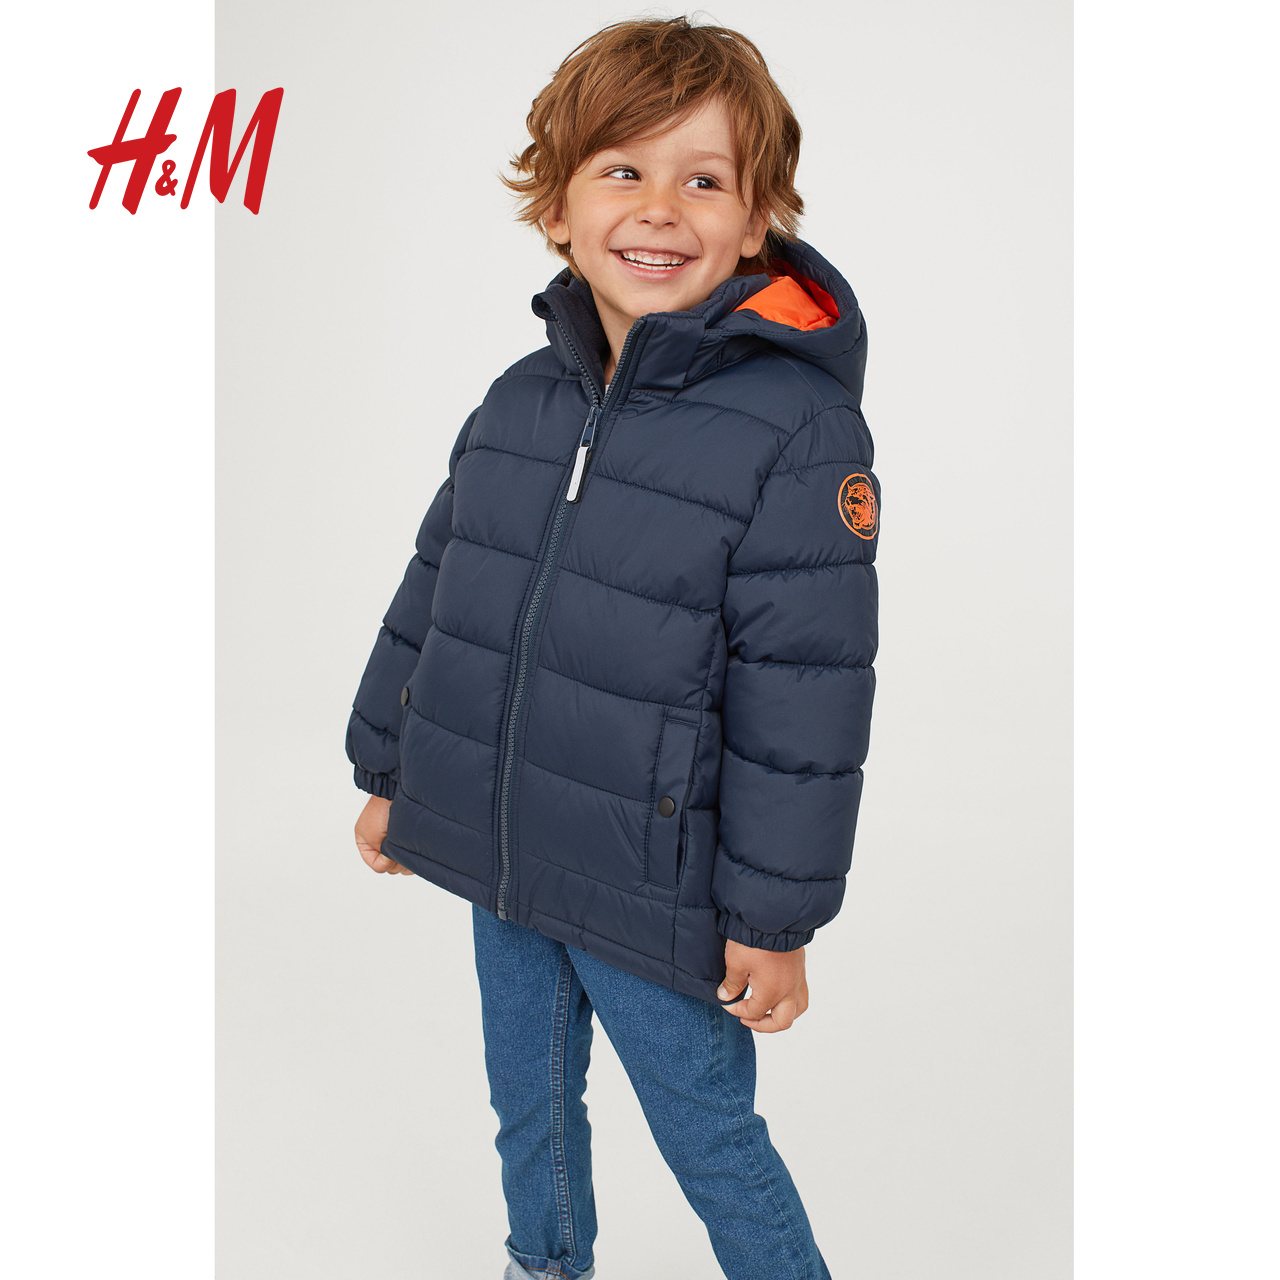 H&M HM0625196 儿童棉服